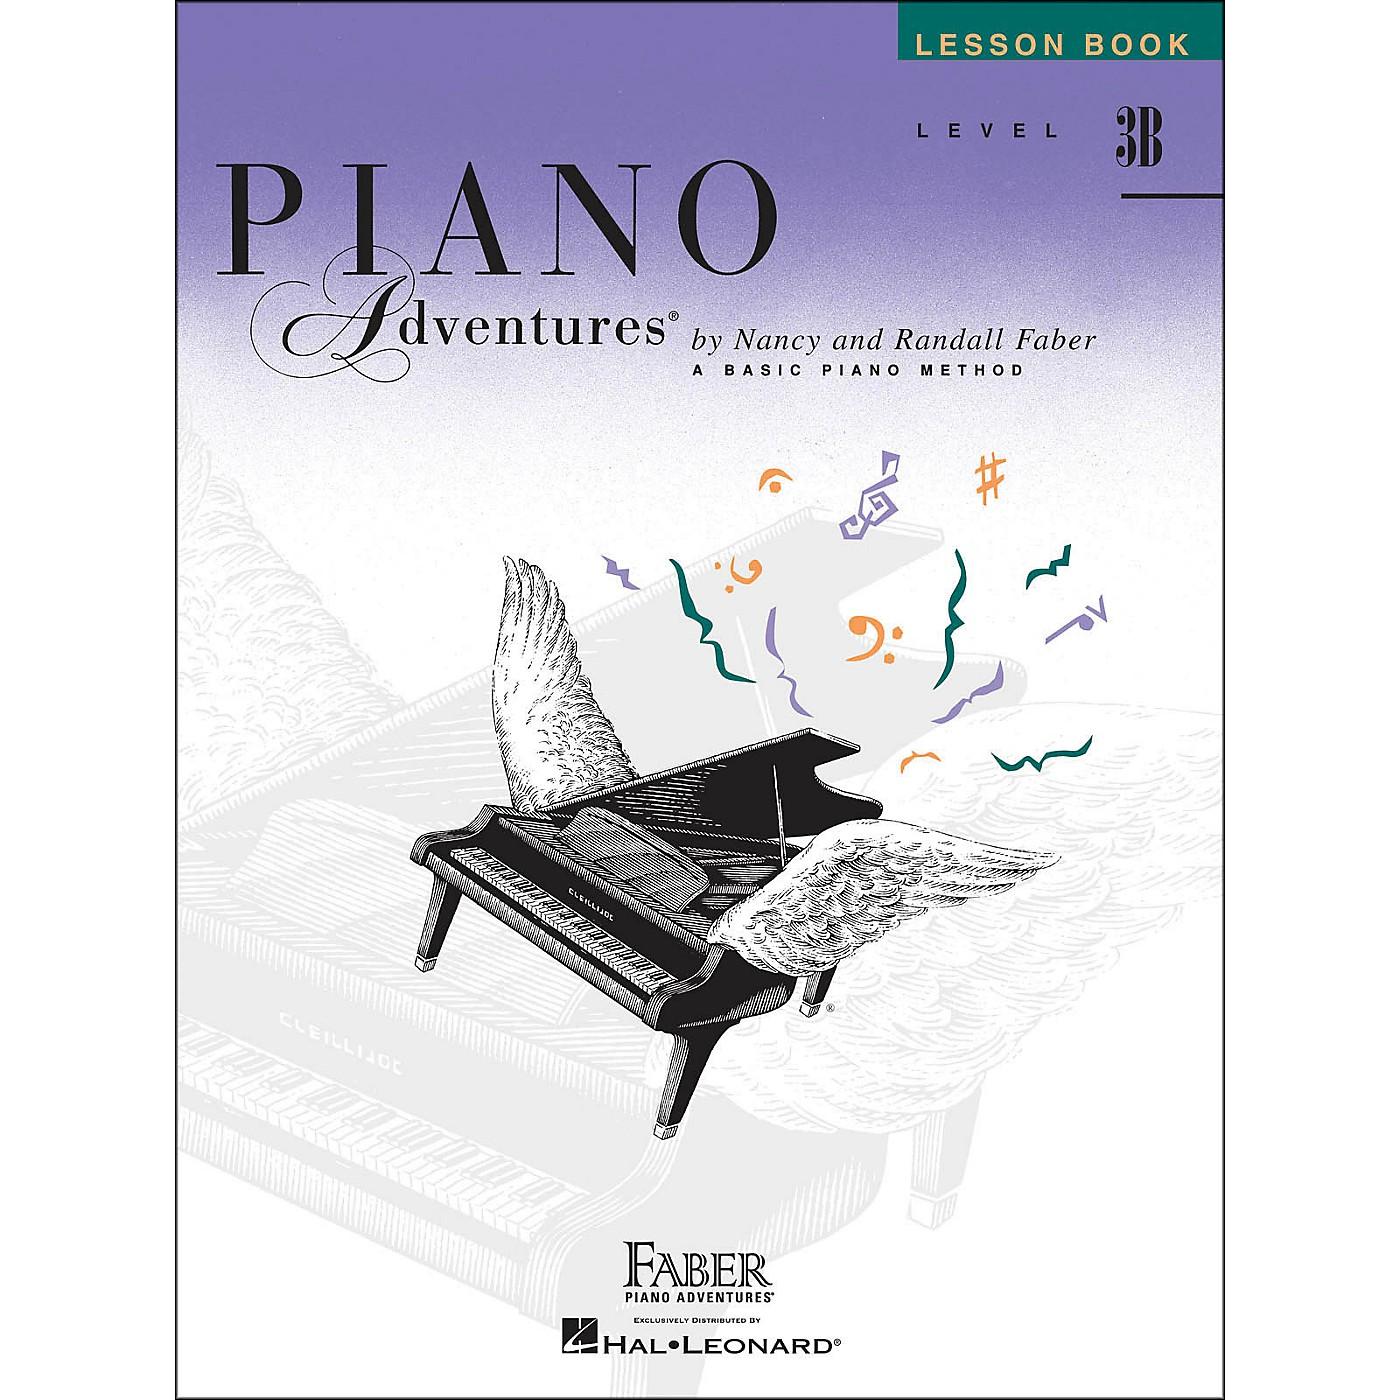 Faber Piano Adventures Piano Adventures Lesson Book Level 3B thumbnail